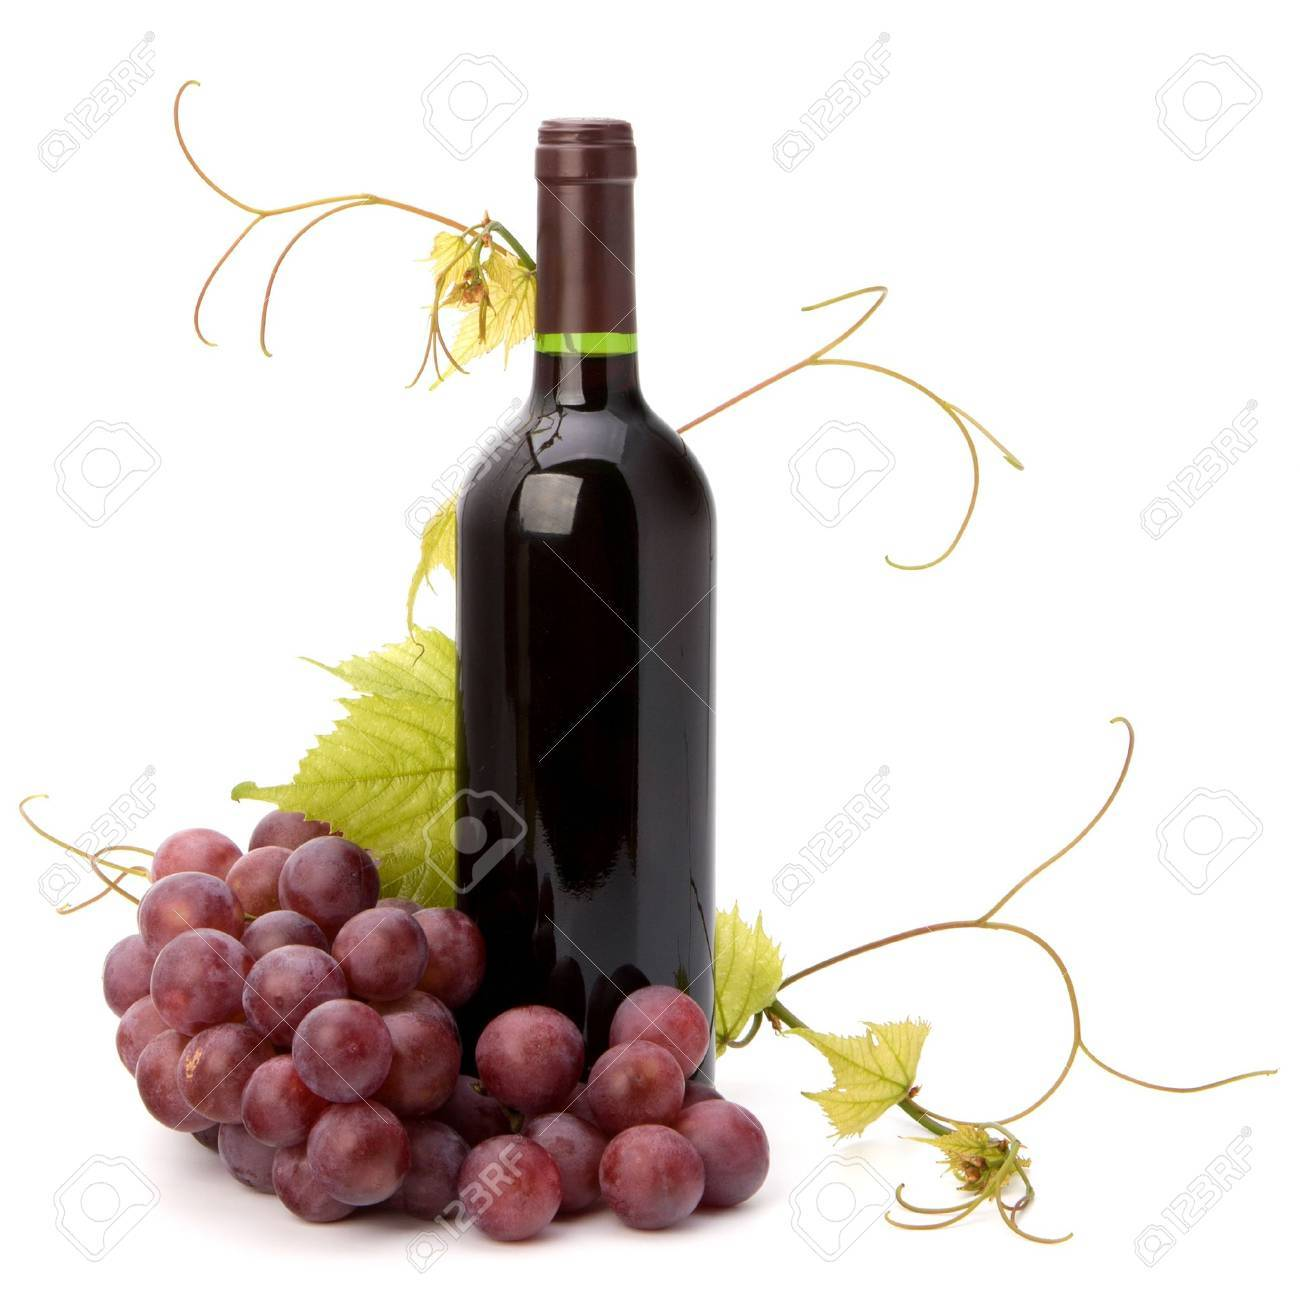 red wine bottle isolated on white background Stock Photo - 9054270